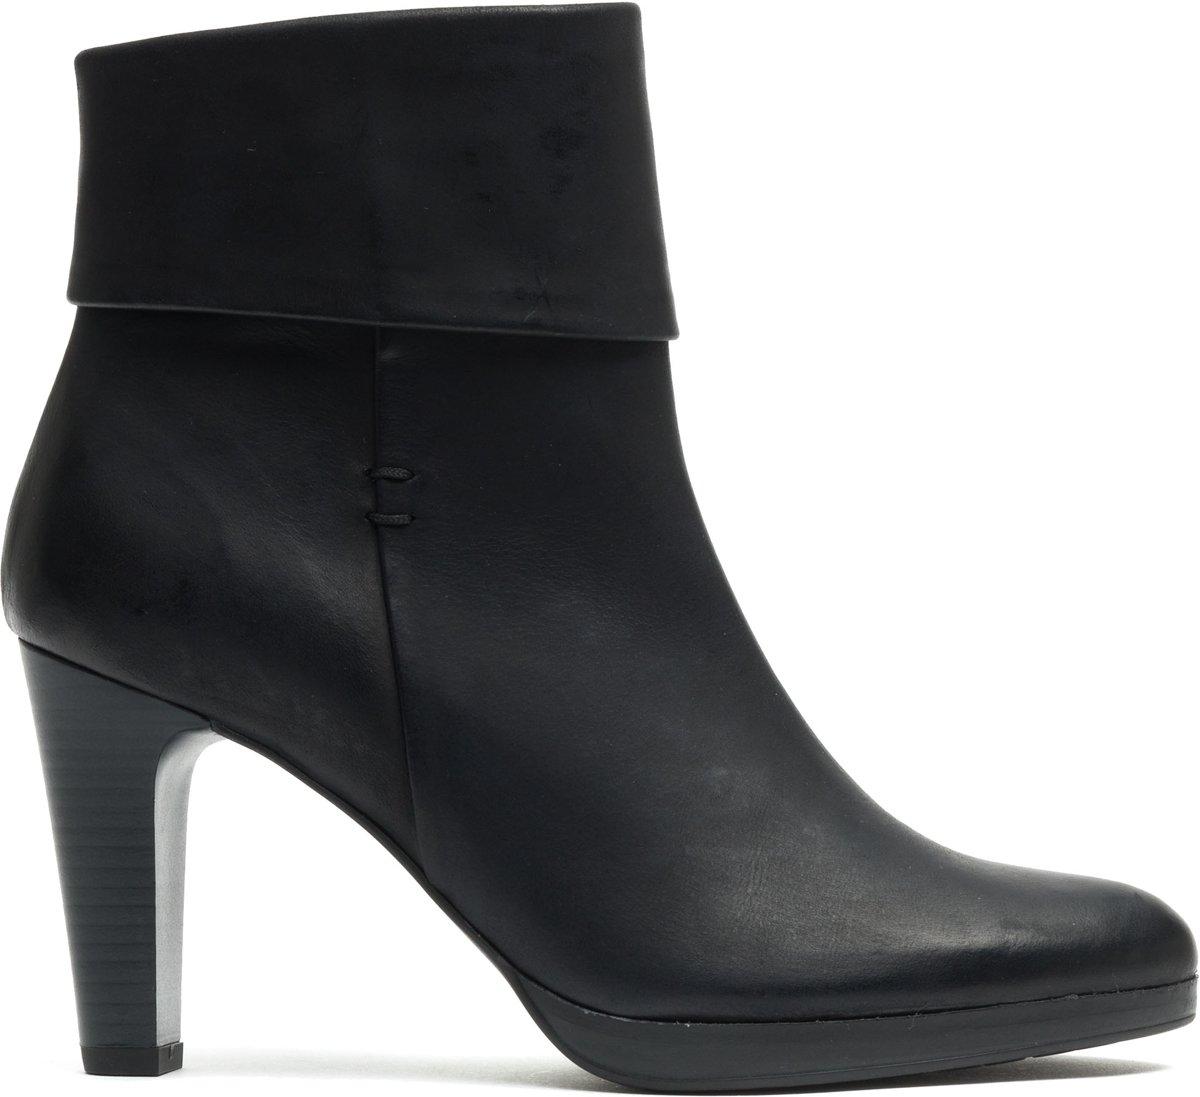 Bottines Linea Zeta Noir - Femmes - Taille 41 oseY6BWpGn